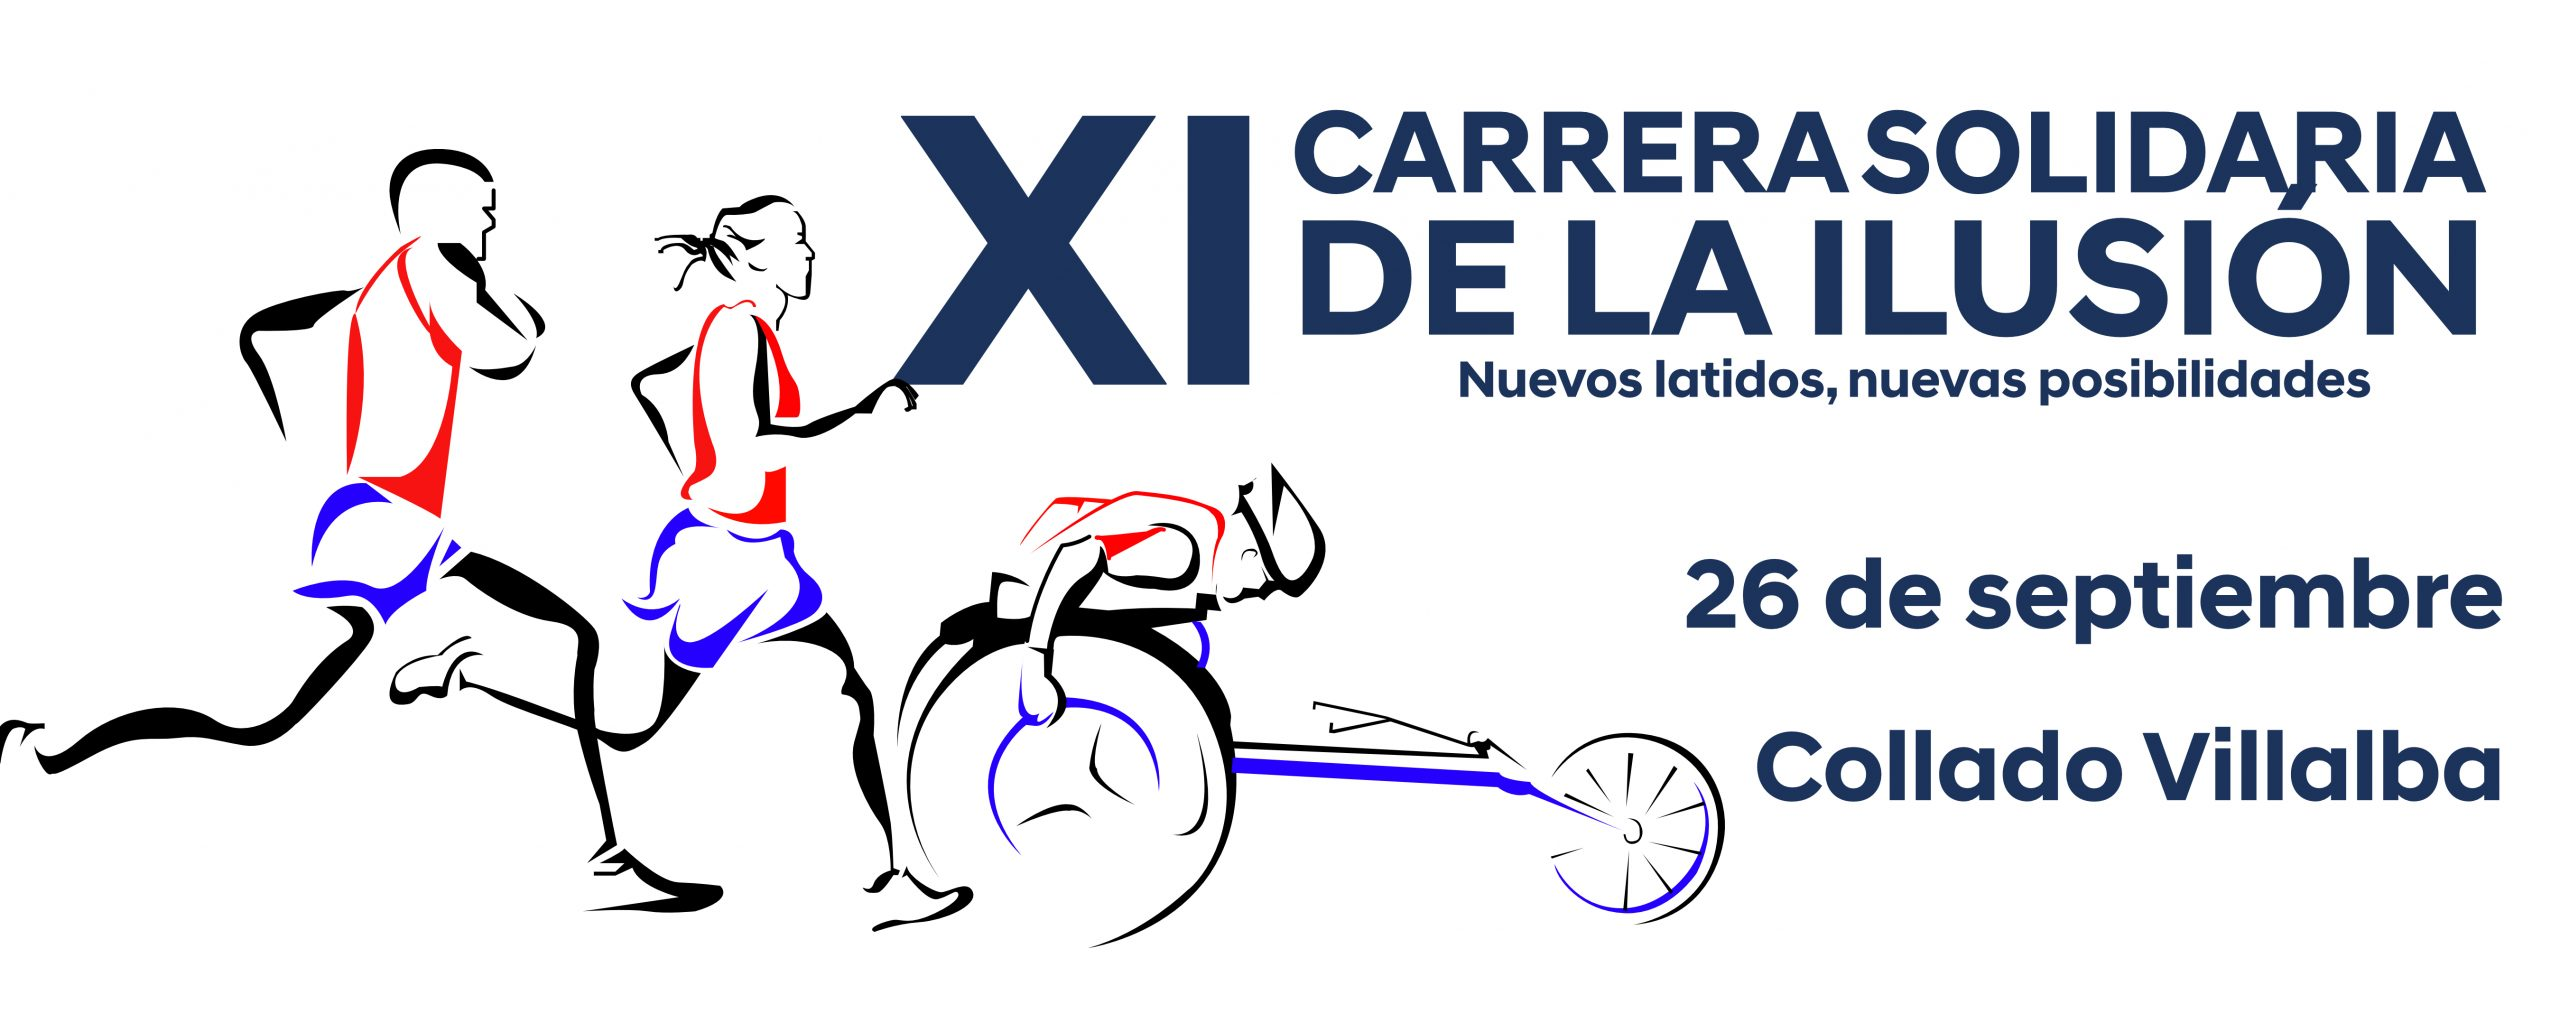 Carrera Solidaria de la Ilusin logo